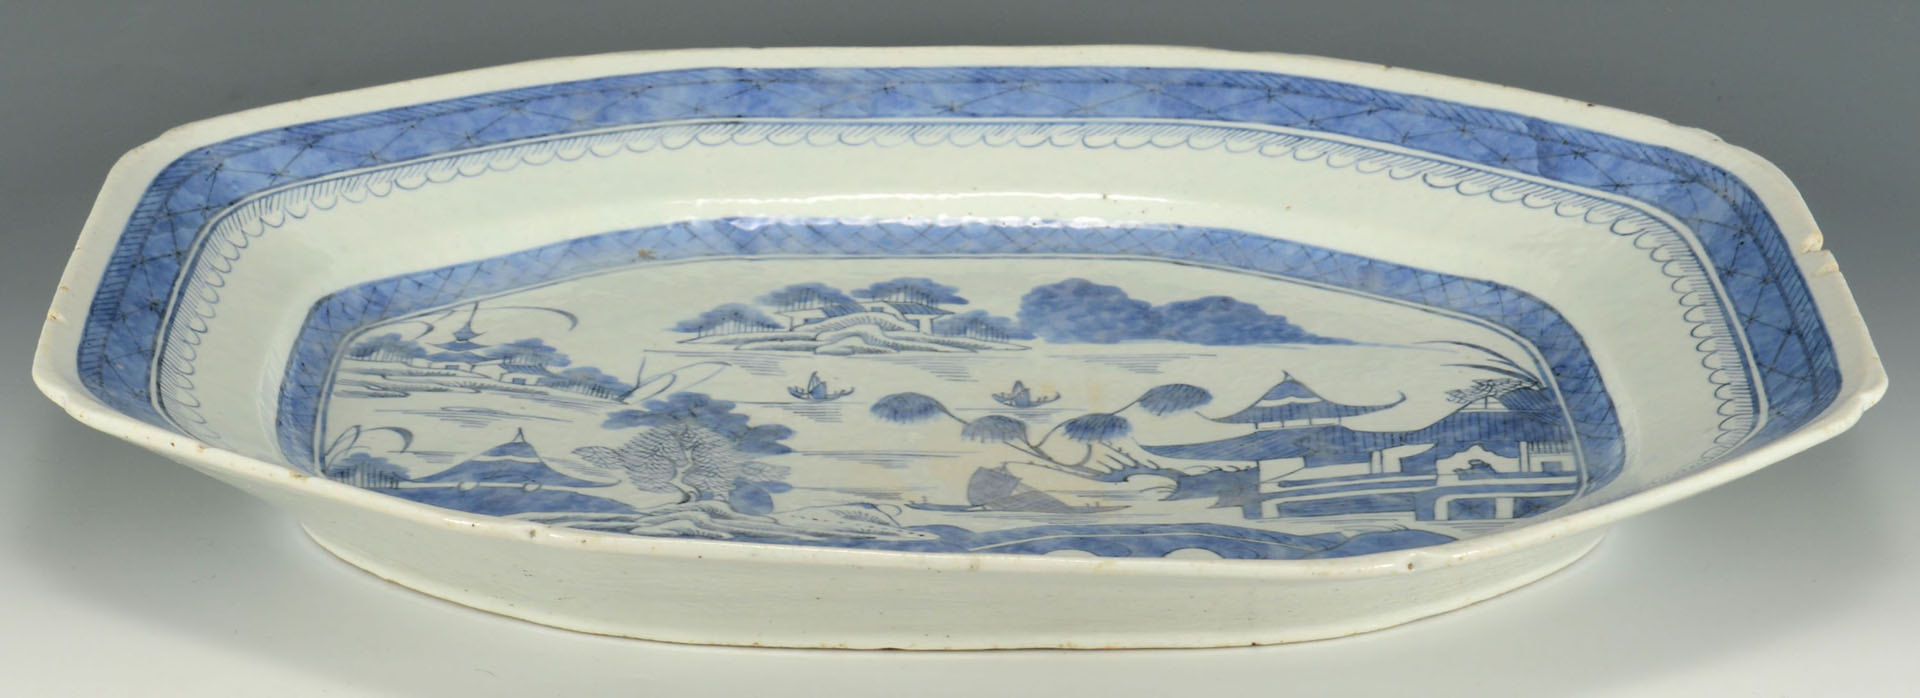 Lot 675: Blue and white Canton porcelain platter